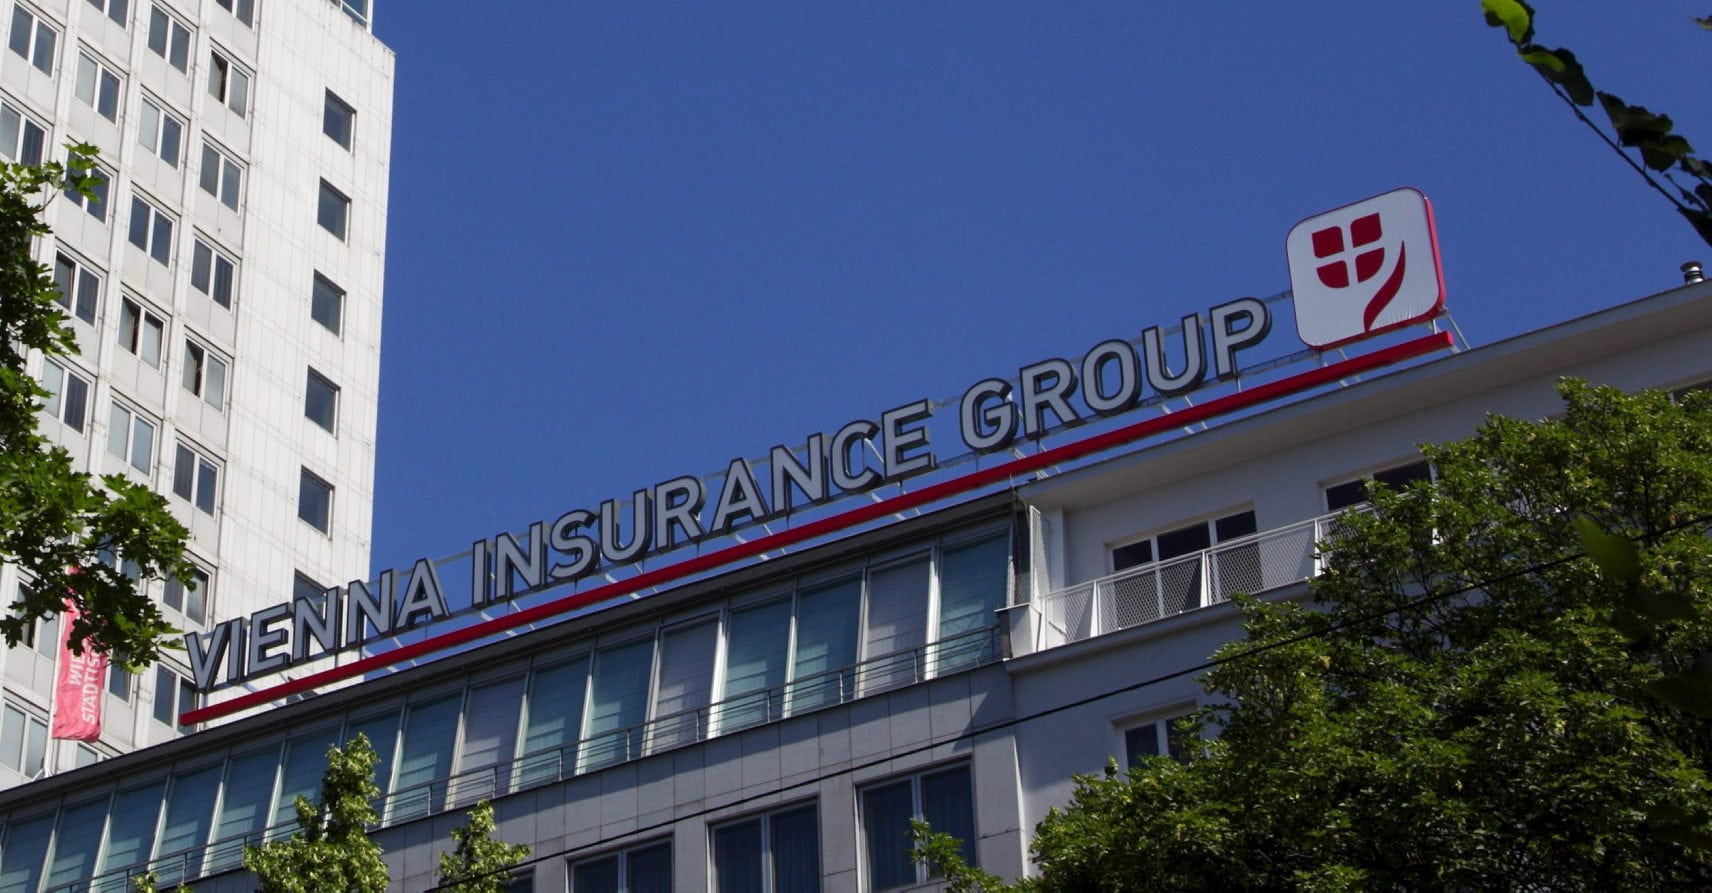 Vienna Insurance